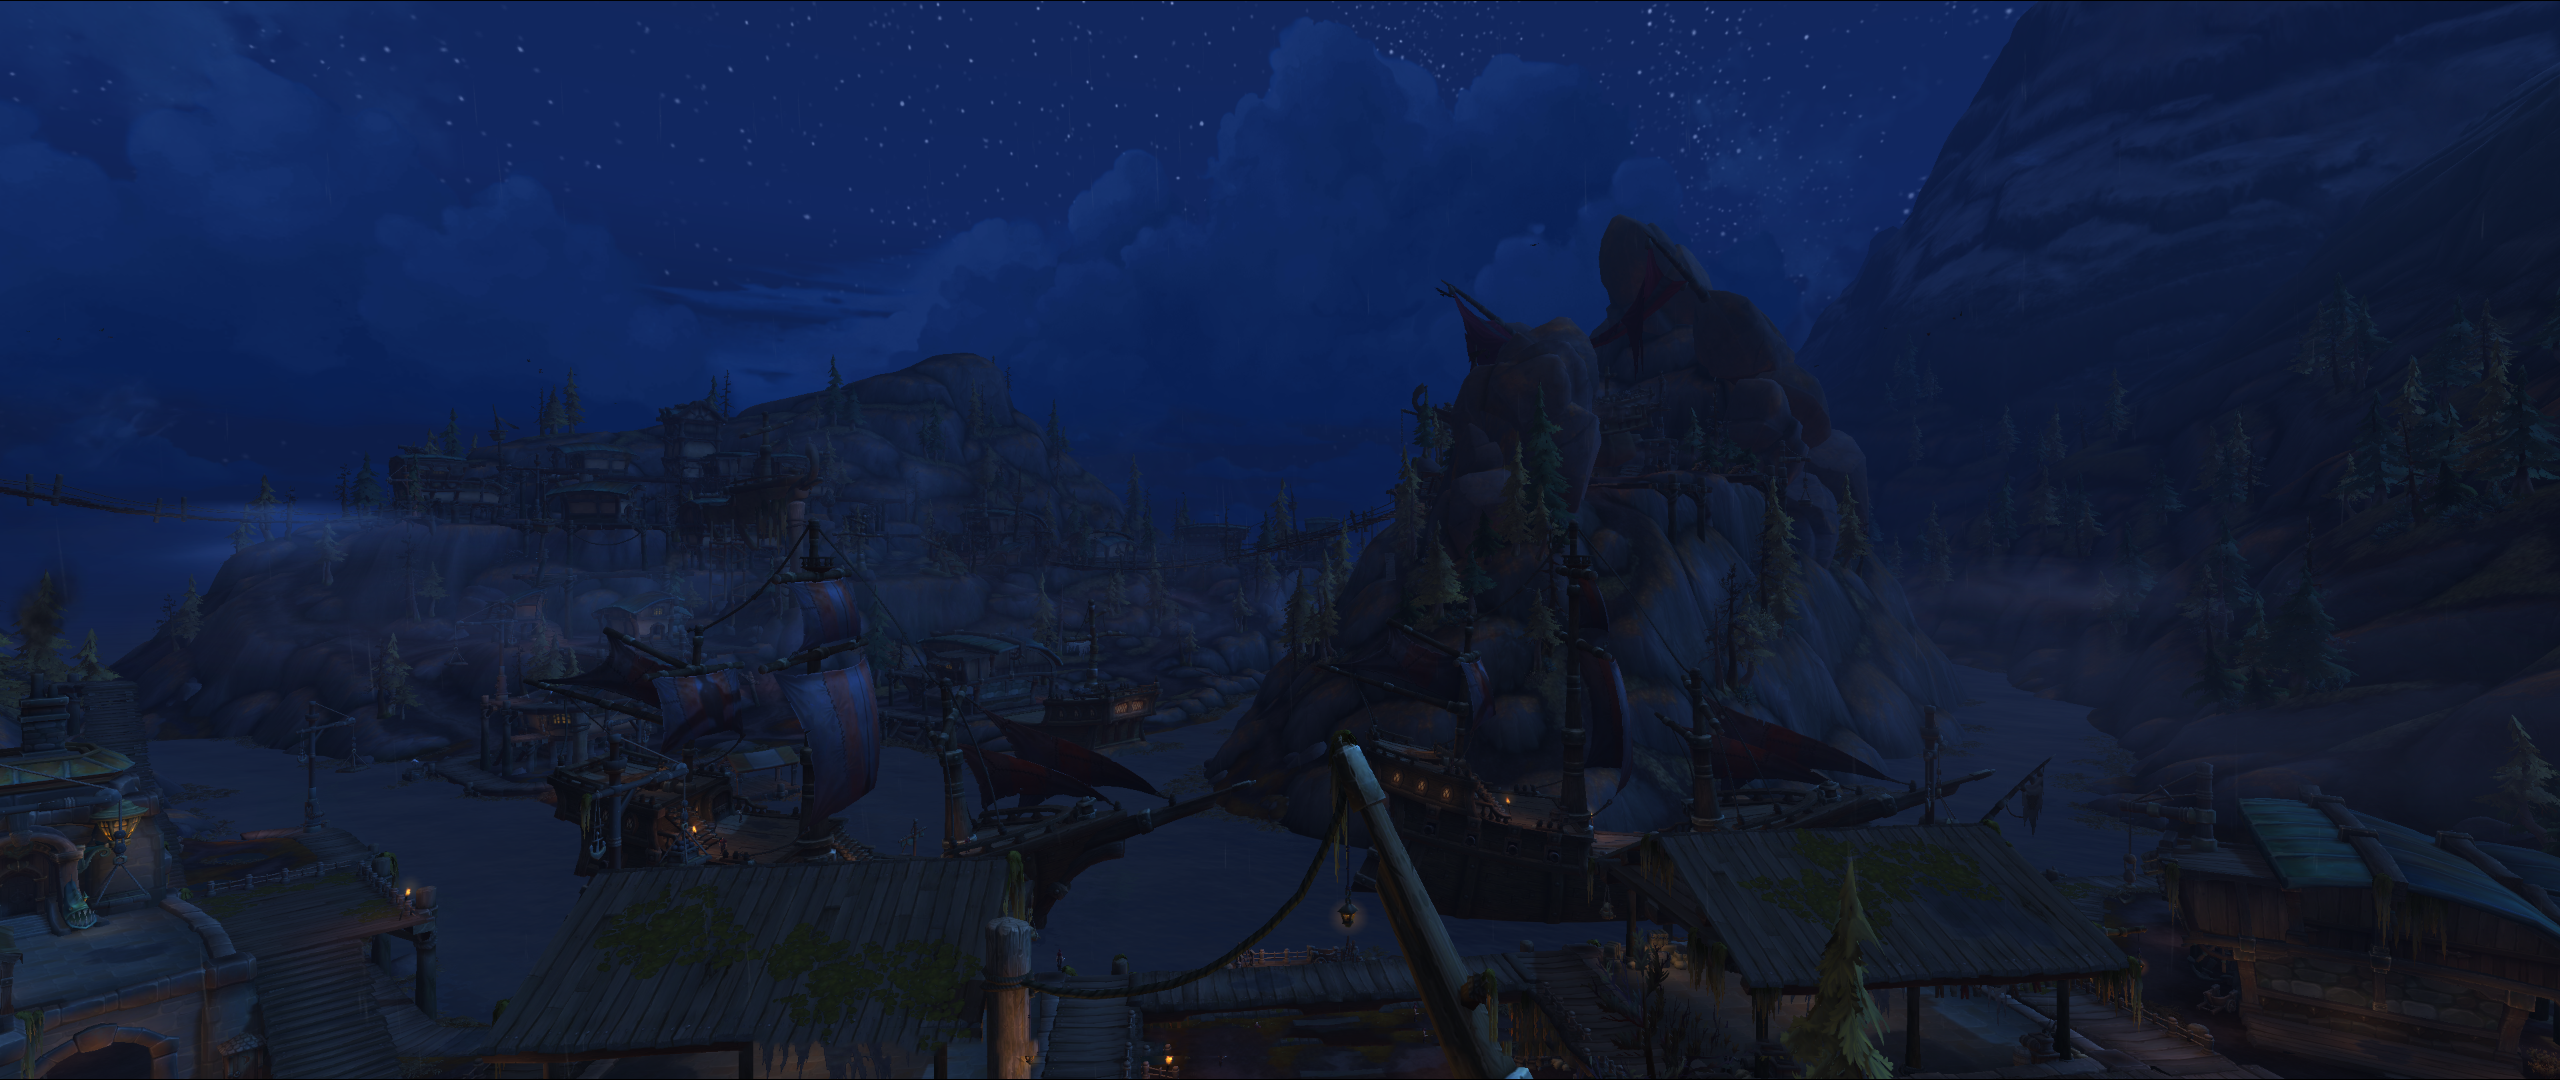 World Of Warcraft Screenshot 2018.08.20 - 03.11.26.23.png - World of Warcraft